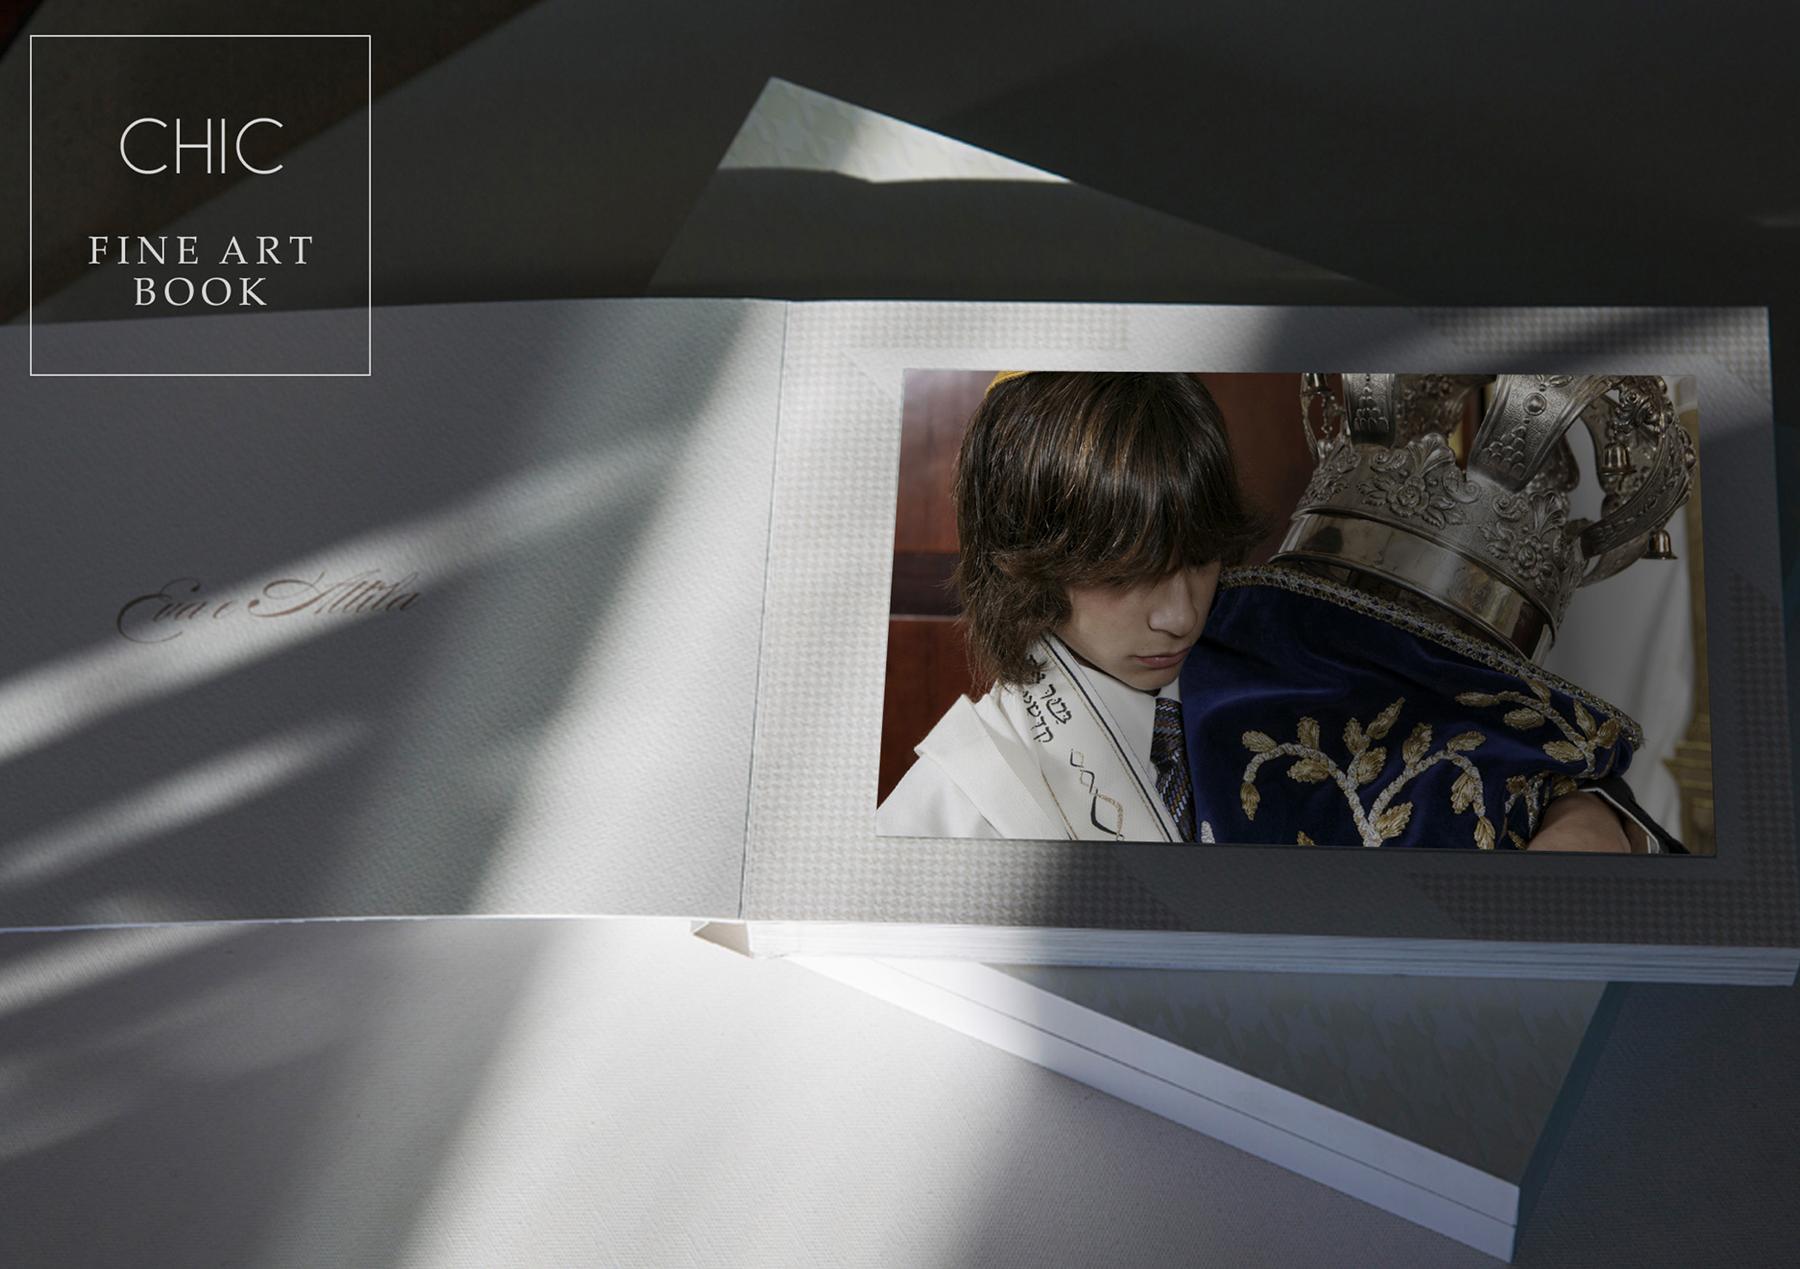 Album Chic - Size 13x9 | Custom Design 30 Pages | $1,100